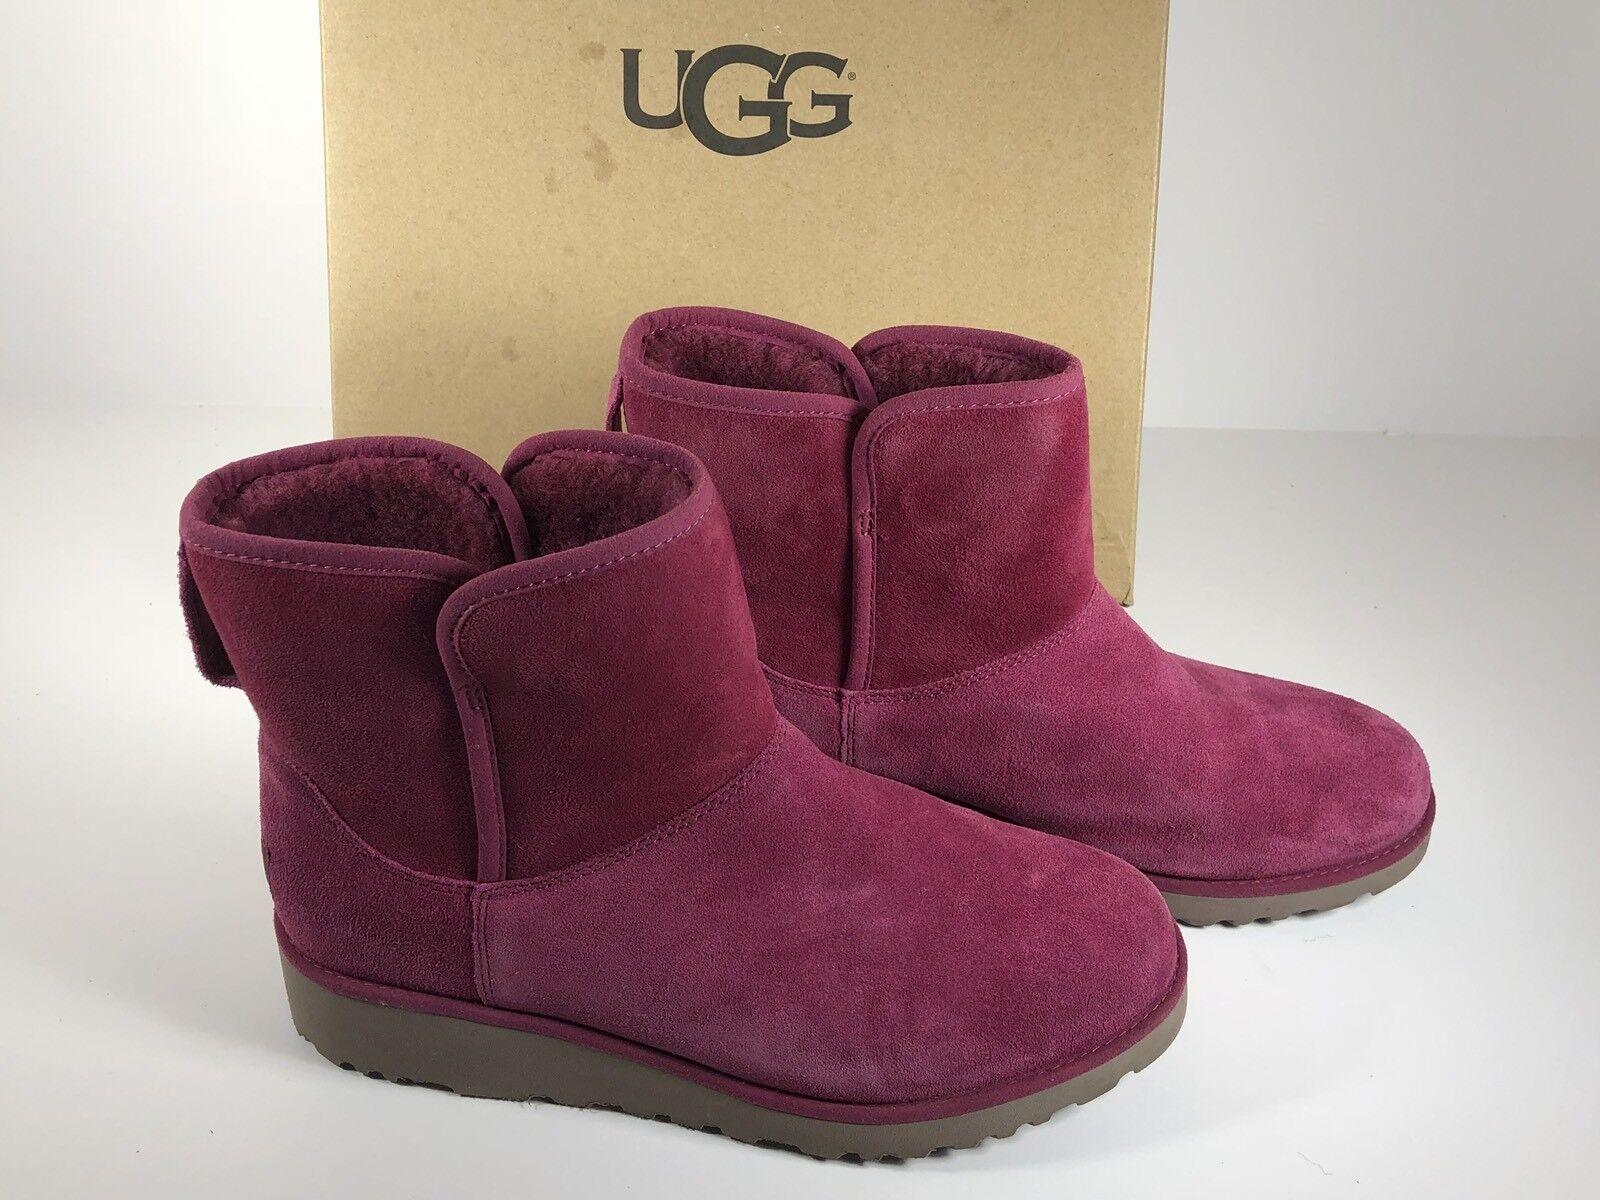 ¡Nuevo!UGG Kristin Lonely Hearts Tamaño 7 Botines mini rosa 1012497 mujeres